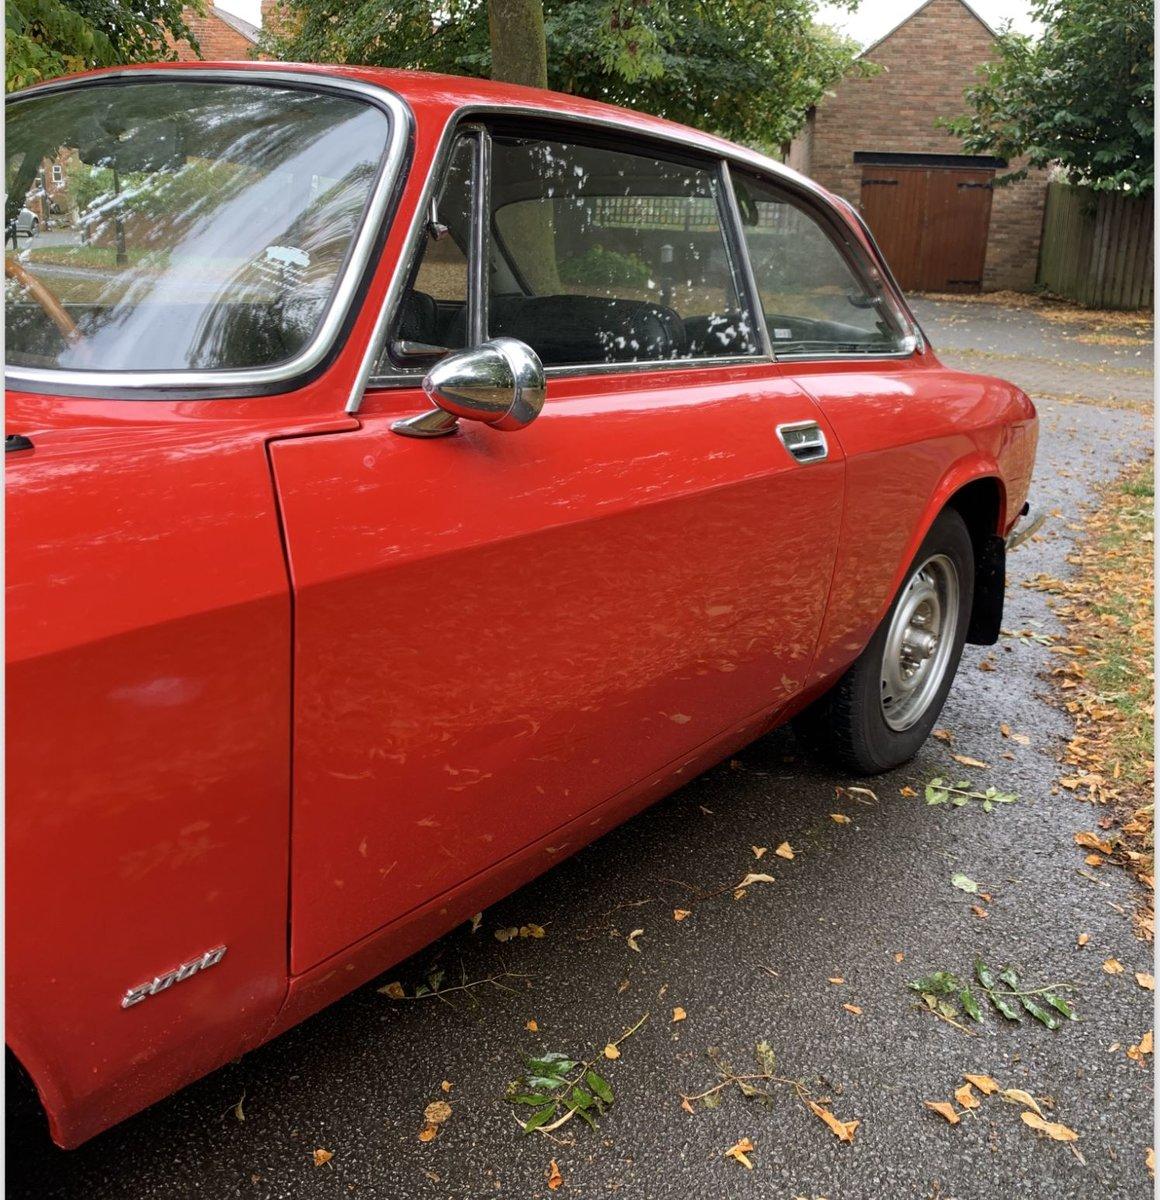 1973 Alfa Romeo 2000 GTV Bertone SOLD